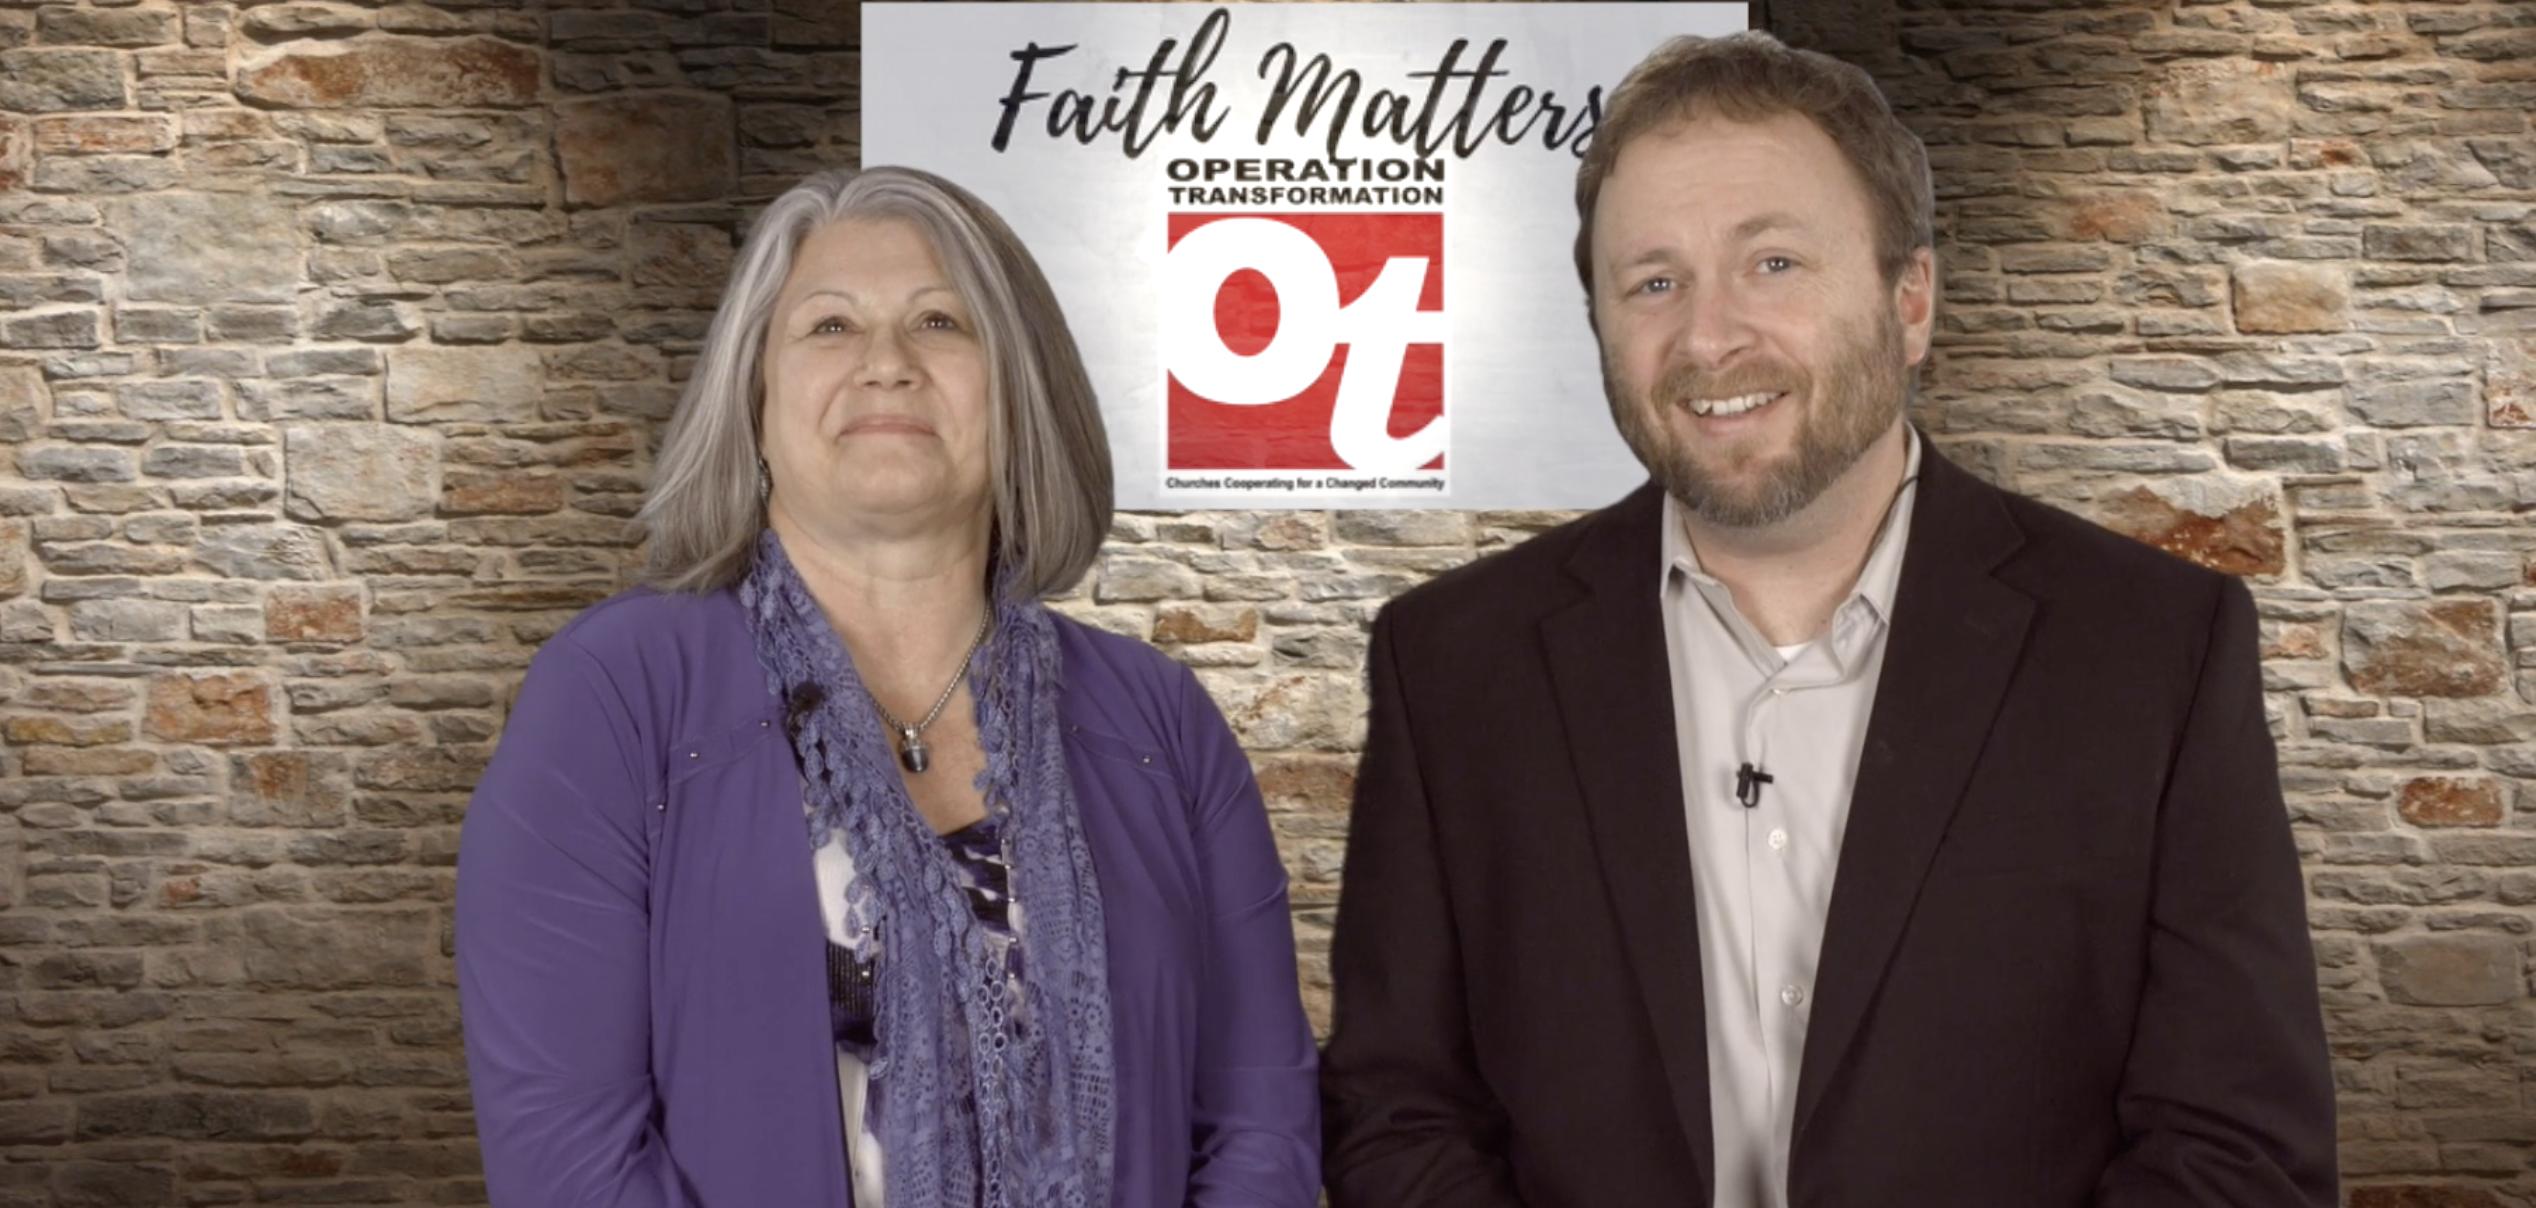 Annette Mercatante: The Bridge Between Faith and Crisis